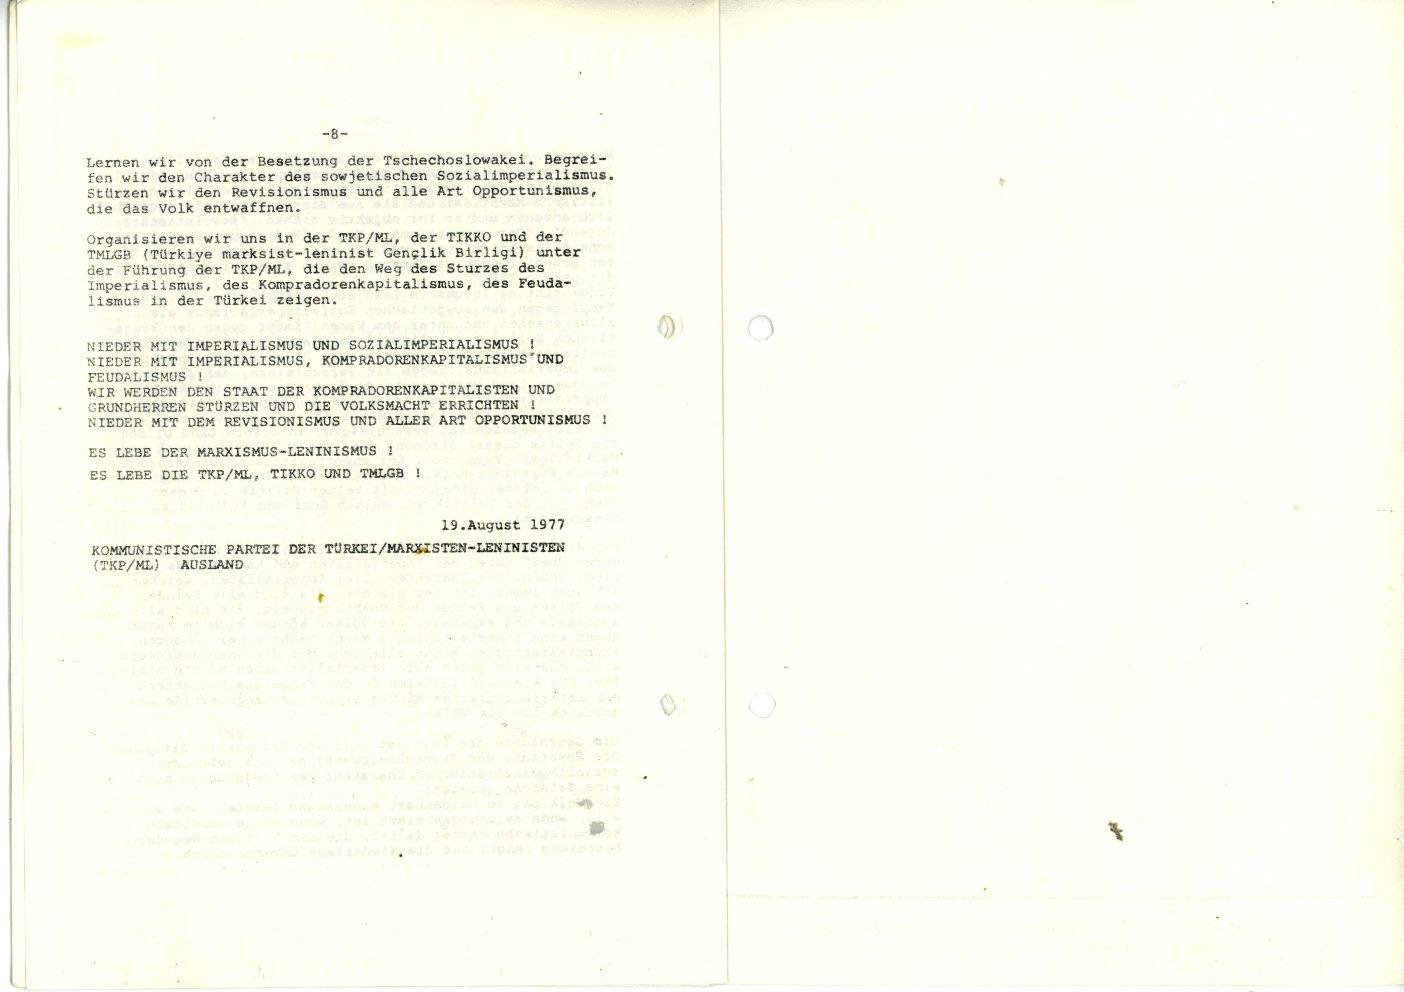 TKPML_1977_02_06